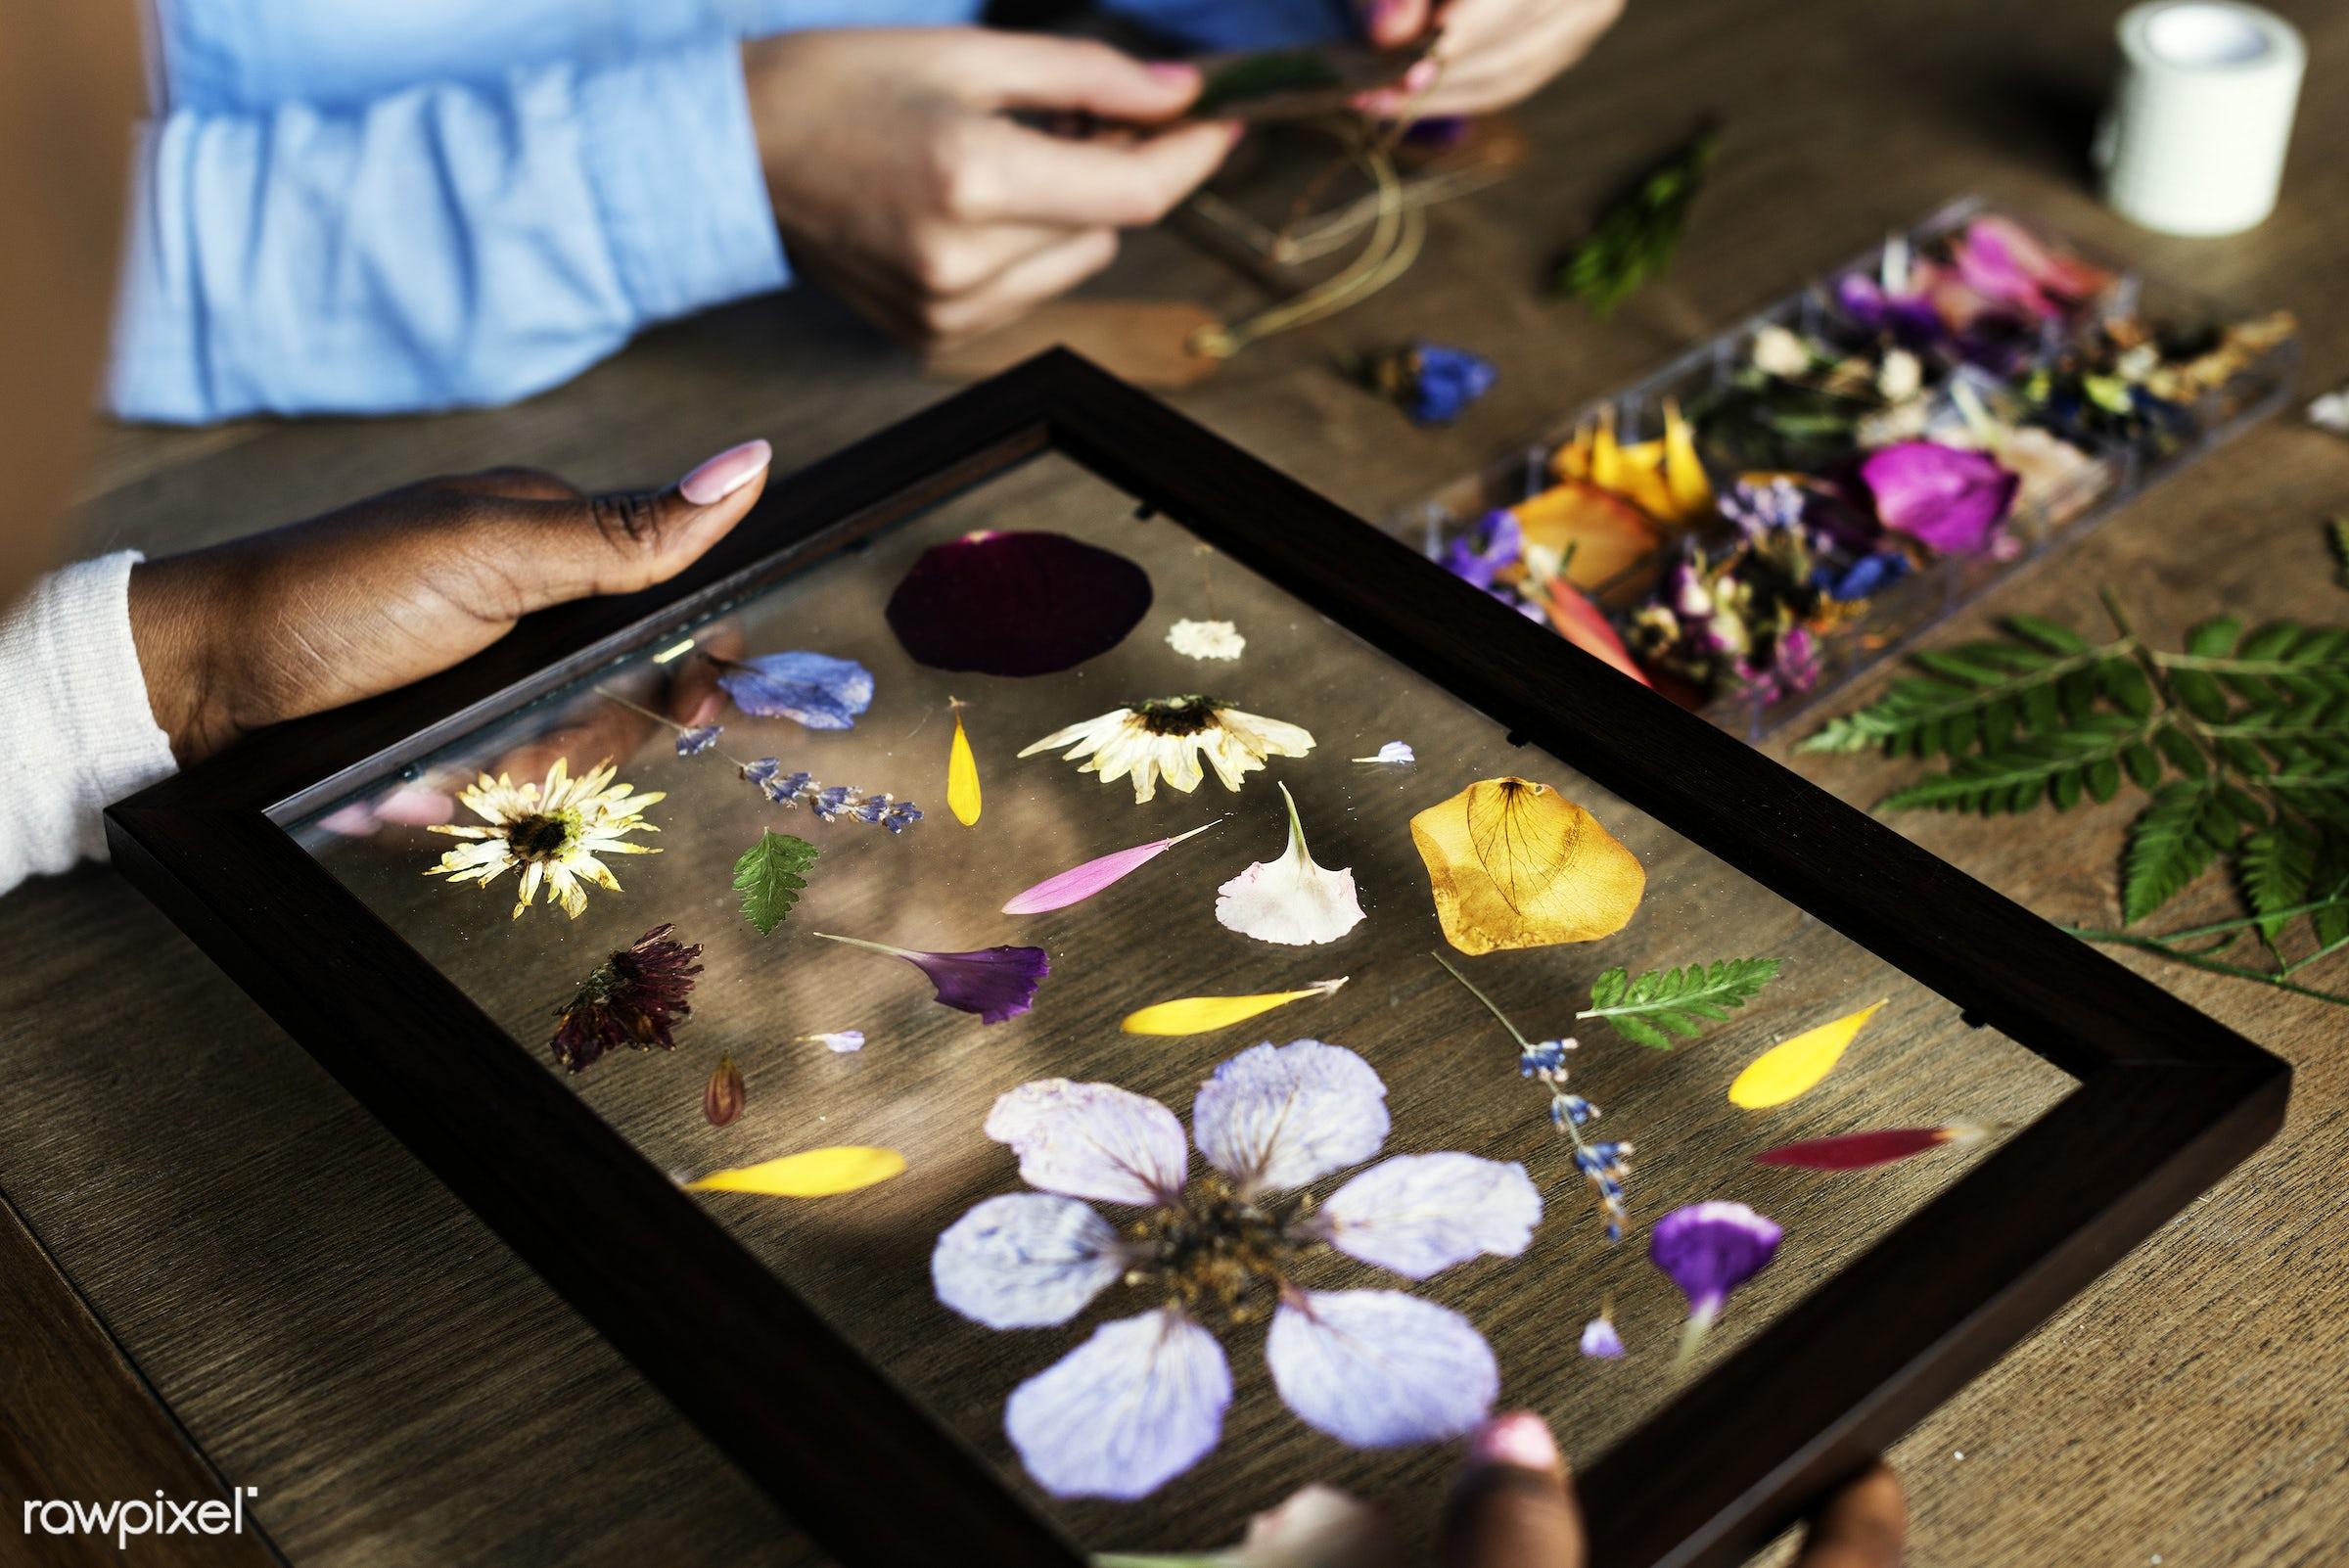 craft, aromatic, decorative, handicraft, beauty, rustic, handiwork, style, nature, hands, dry, vintage, flora, beautiful,...